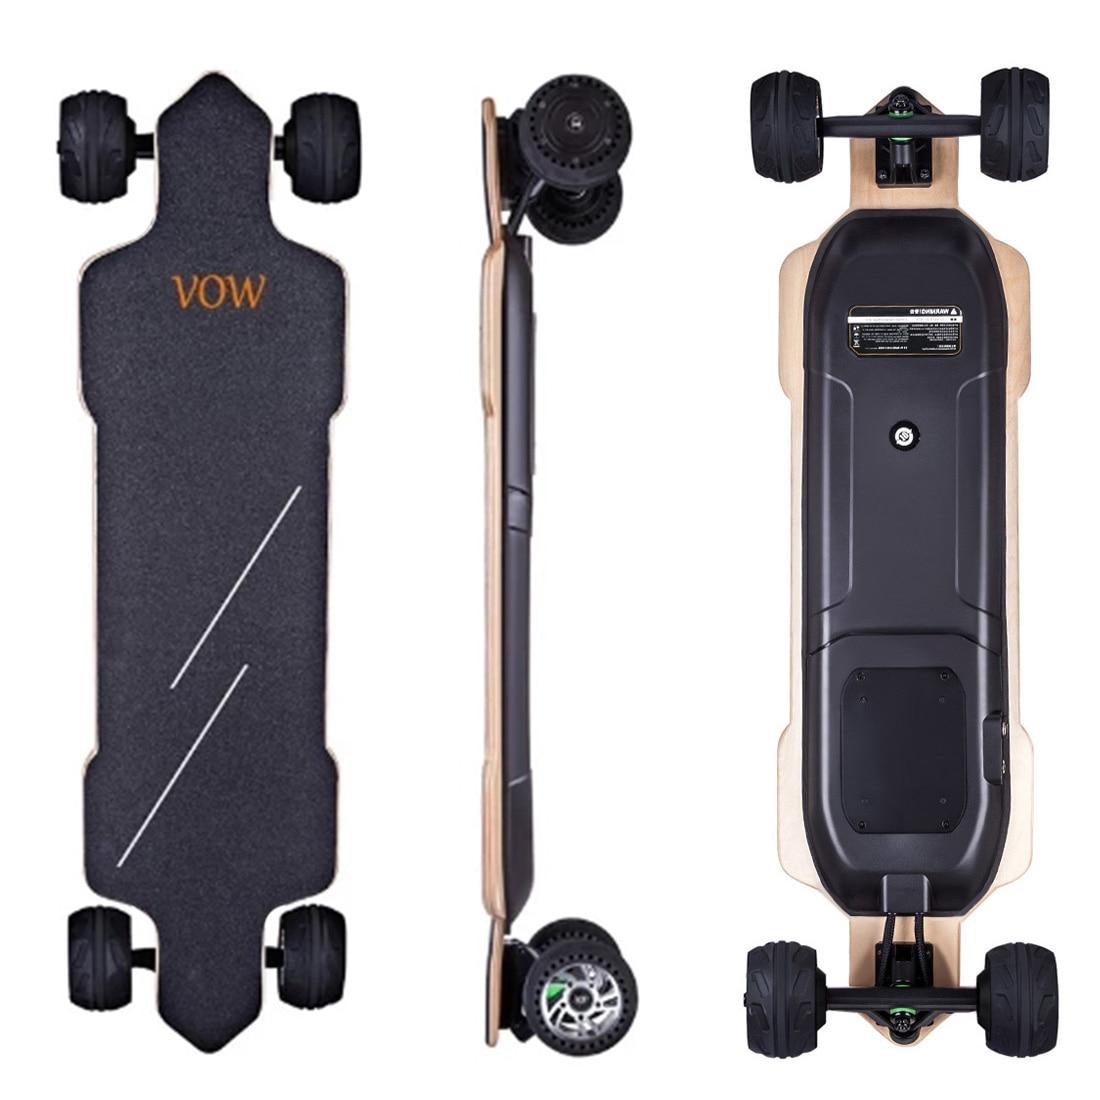 1 PCS Vowboard CT-03 4-Wheel Electric Skateboard - UK Plug/AU Plug/EU Plug/US Plug